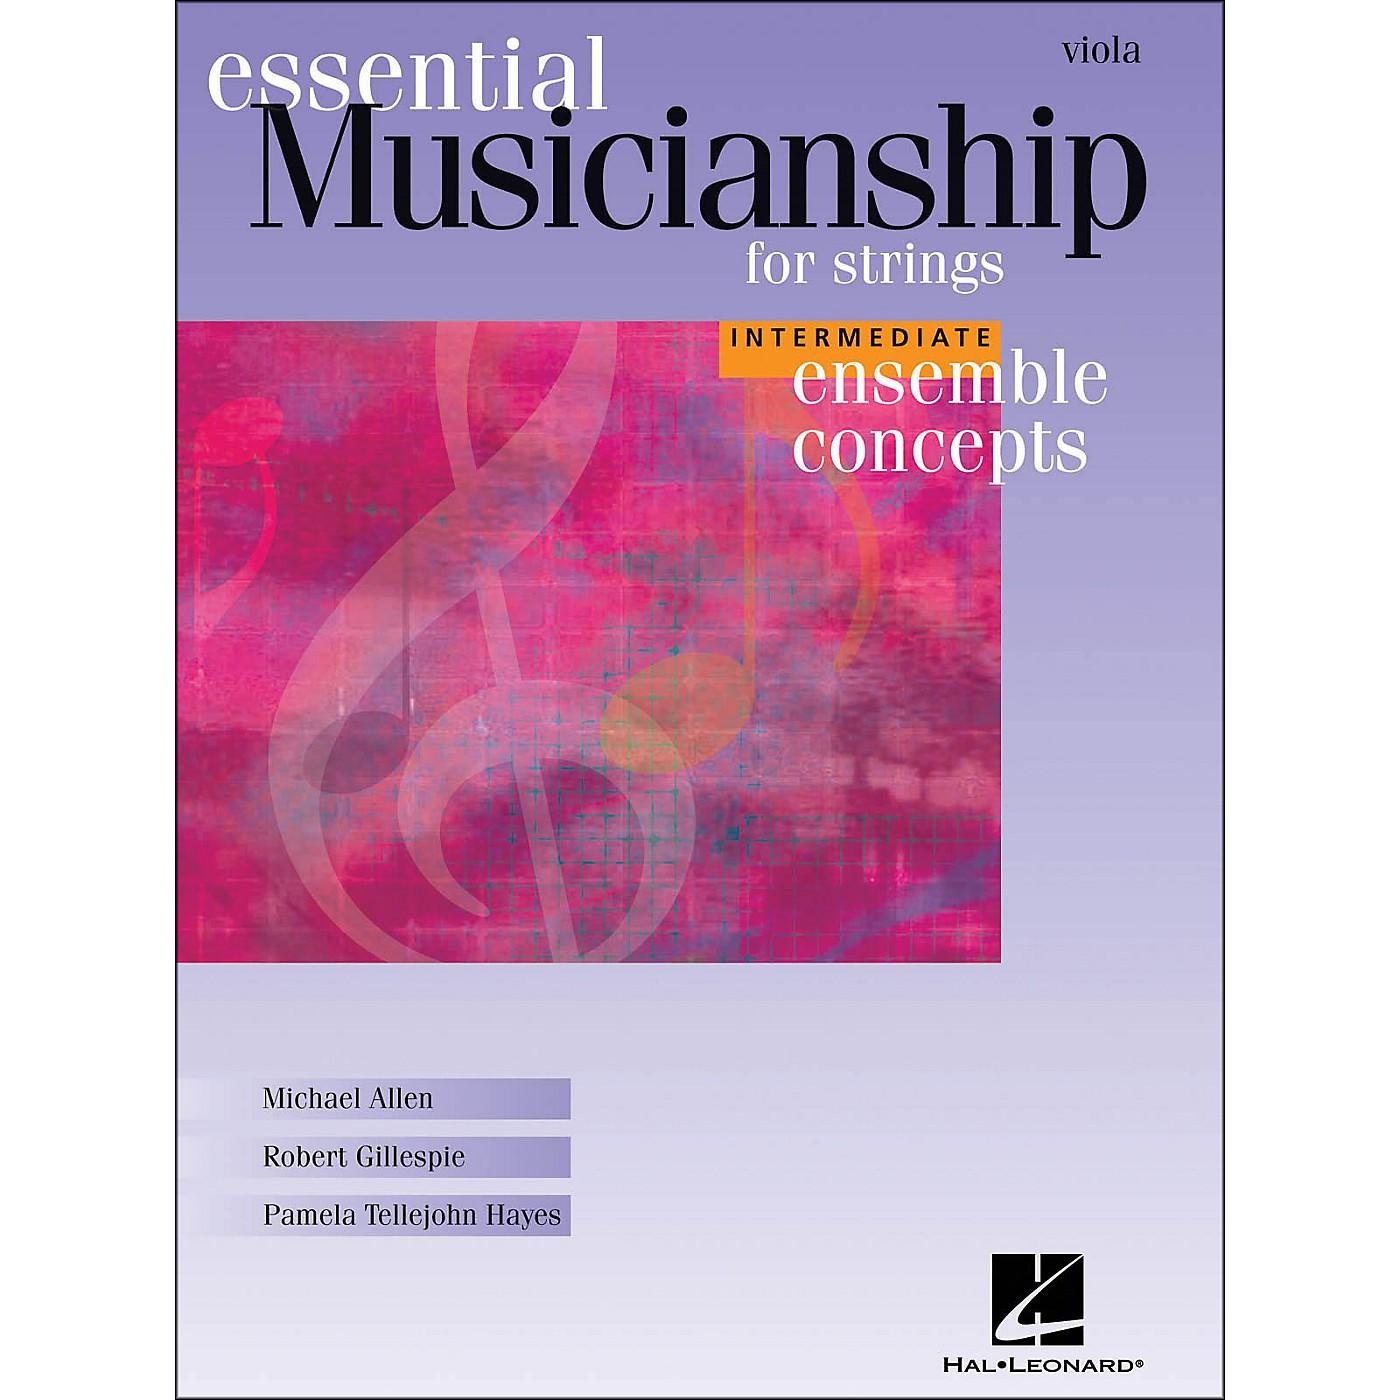 Hal Leonard Essential Musicianship for Strings - Ensemble Concepts Intermediate Viola thumbnail